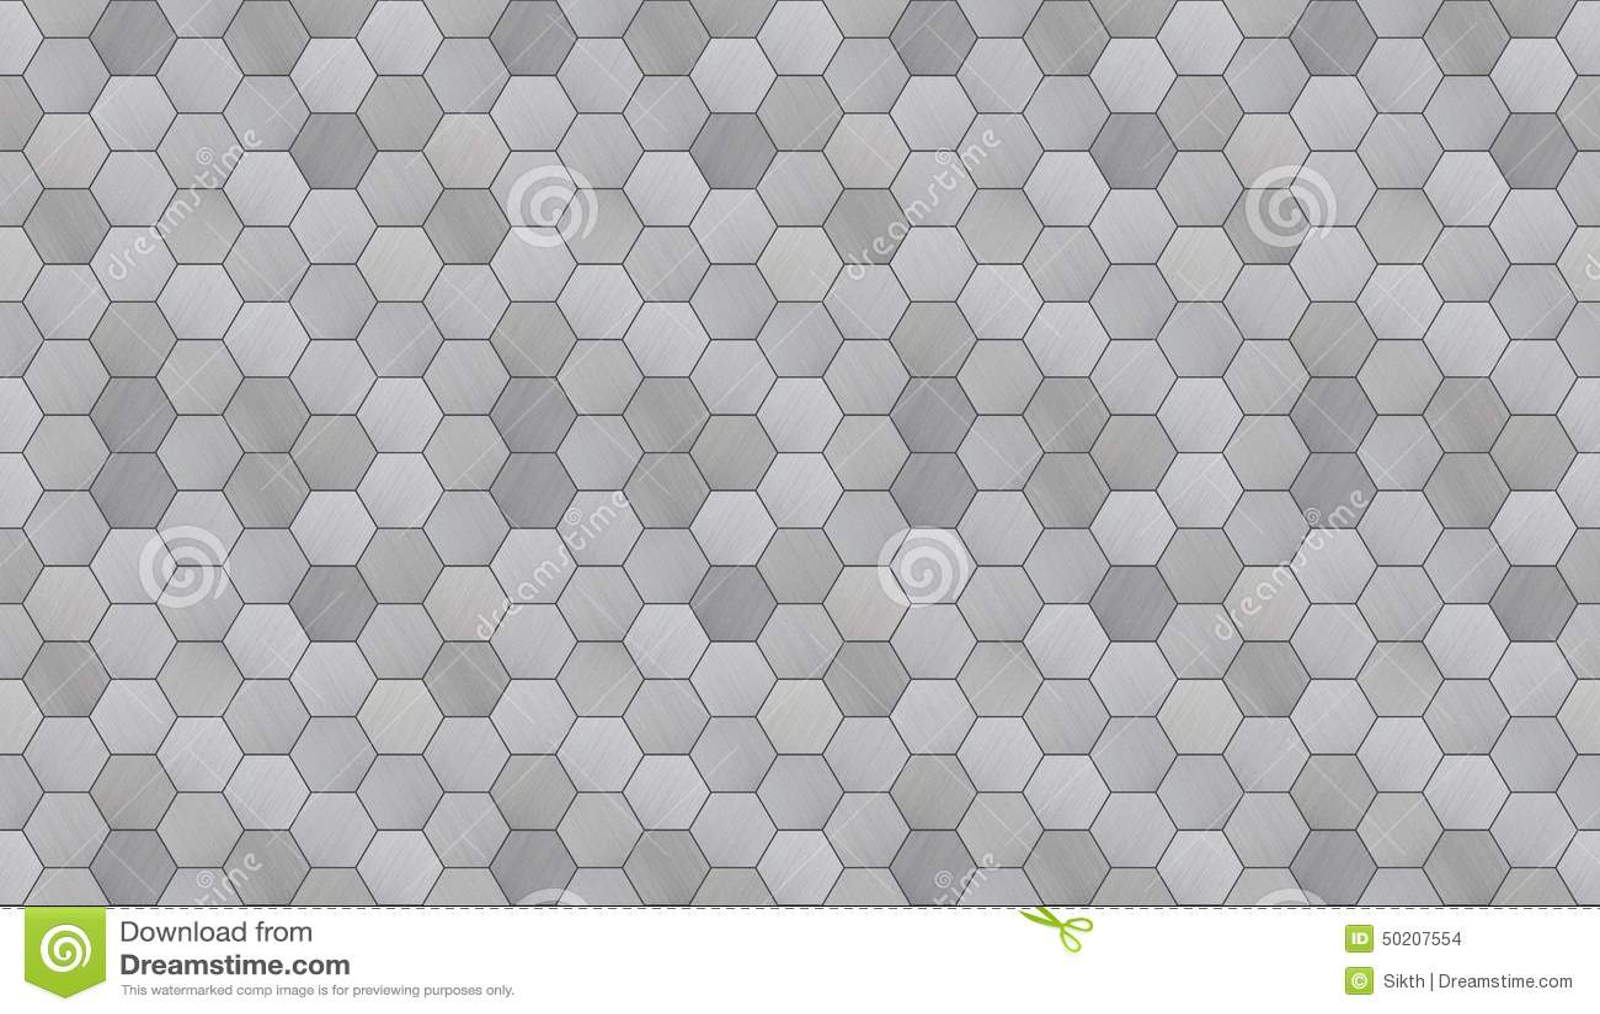 Futuristic Hexagonal Aluminum Tiled Seamless Texture Stock